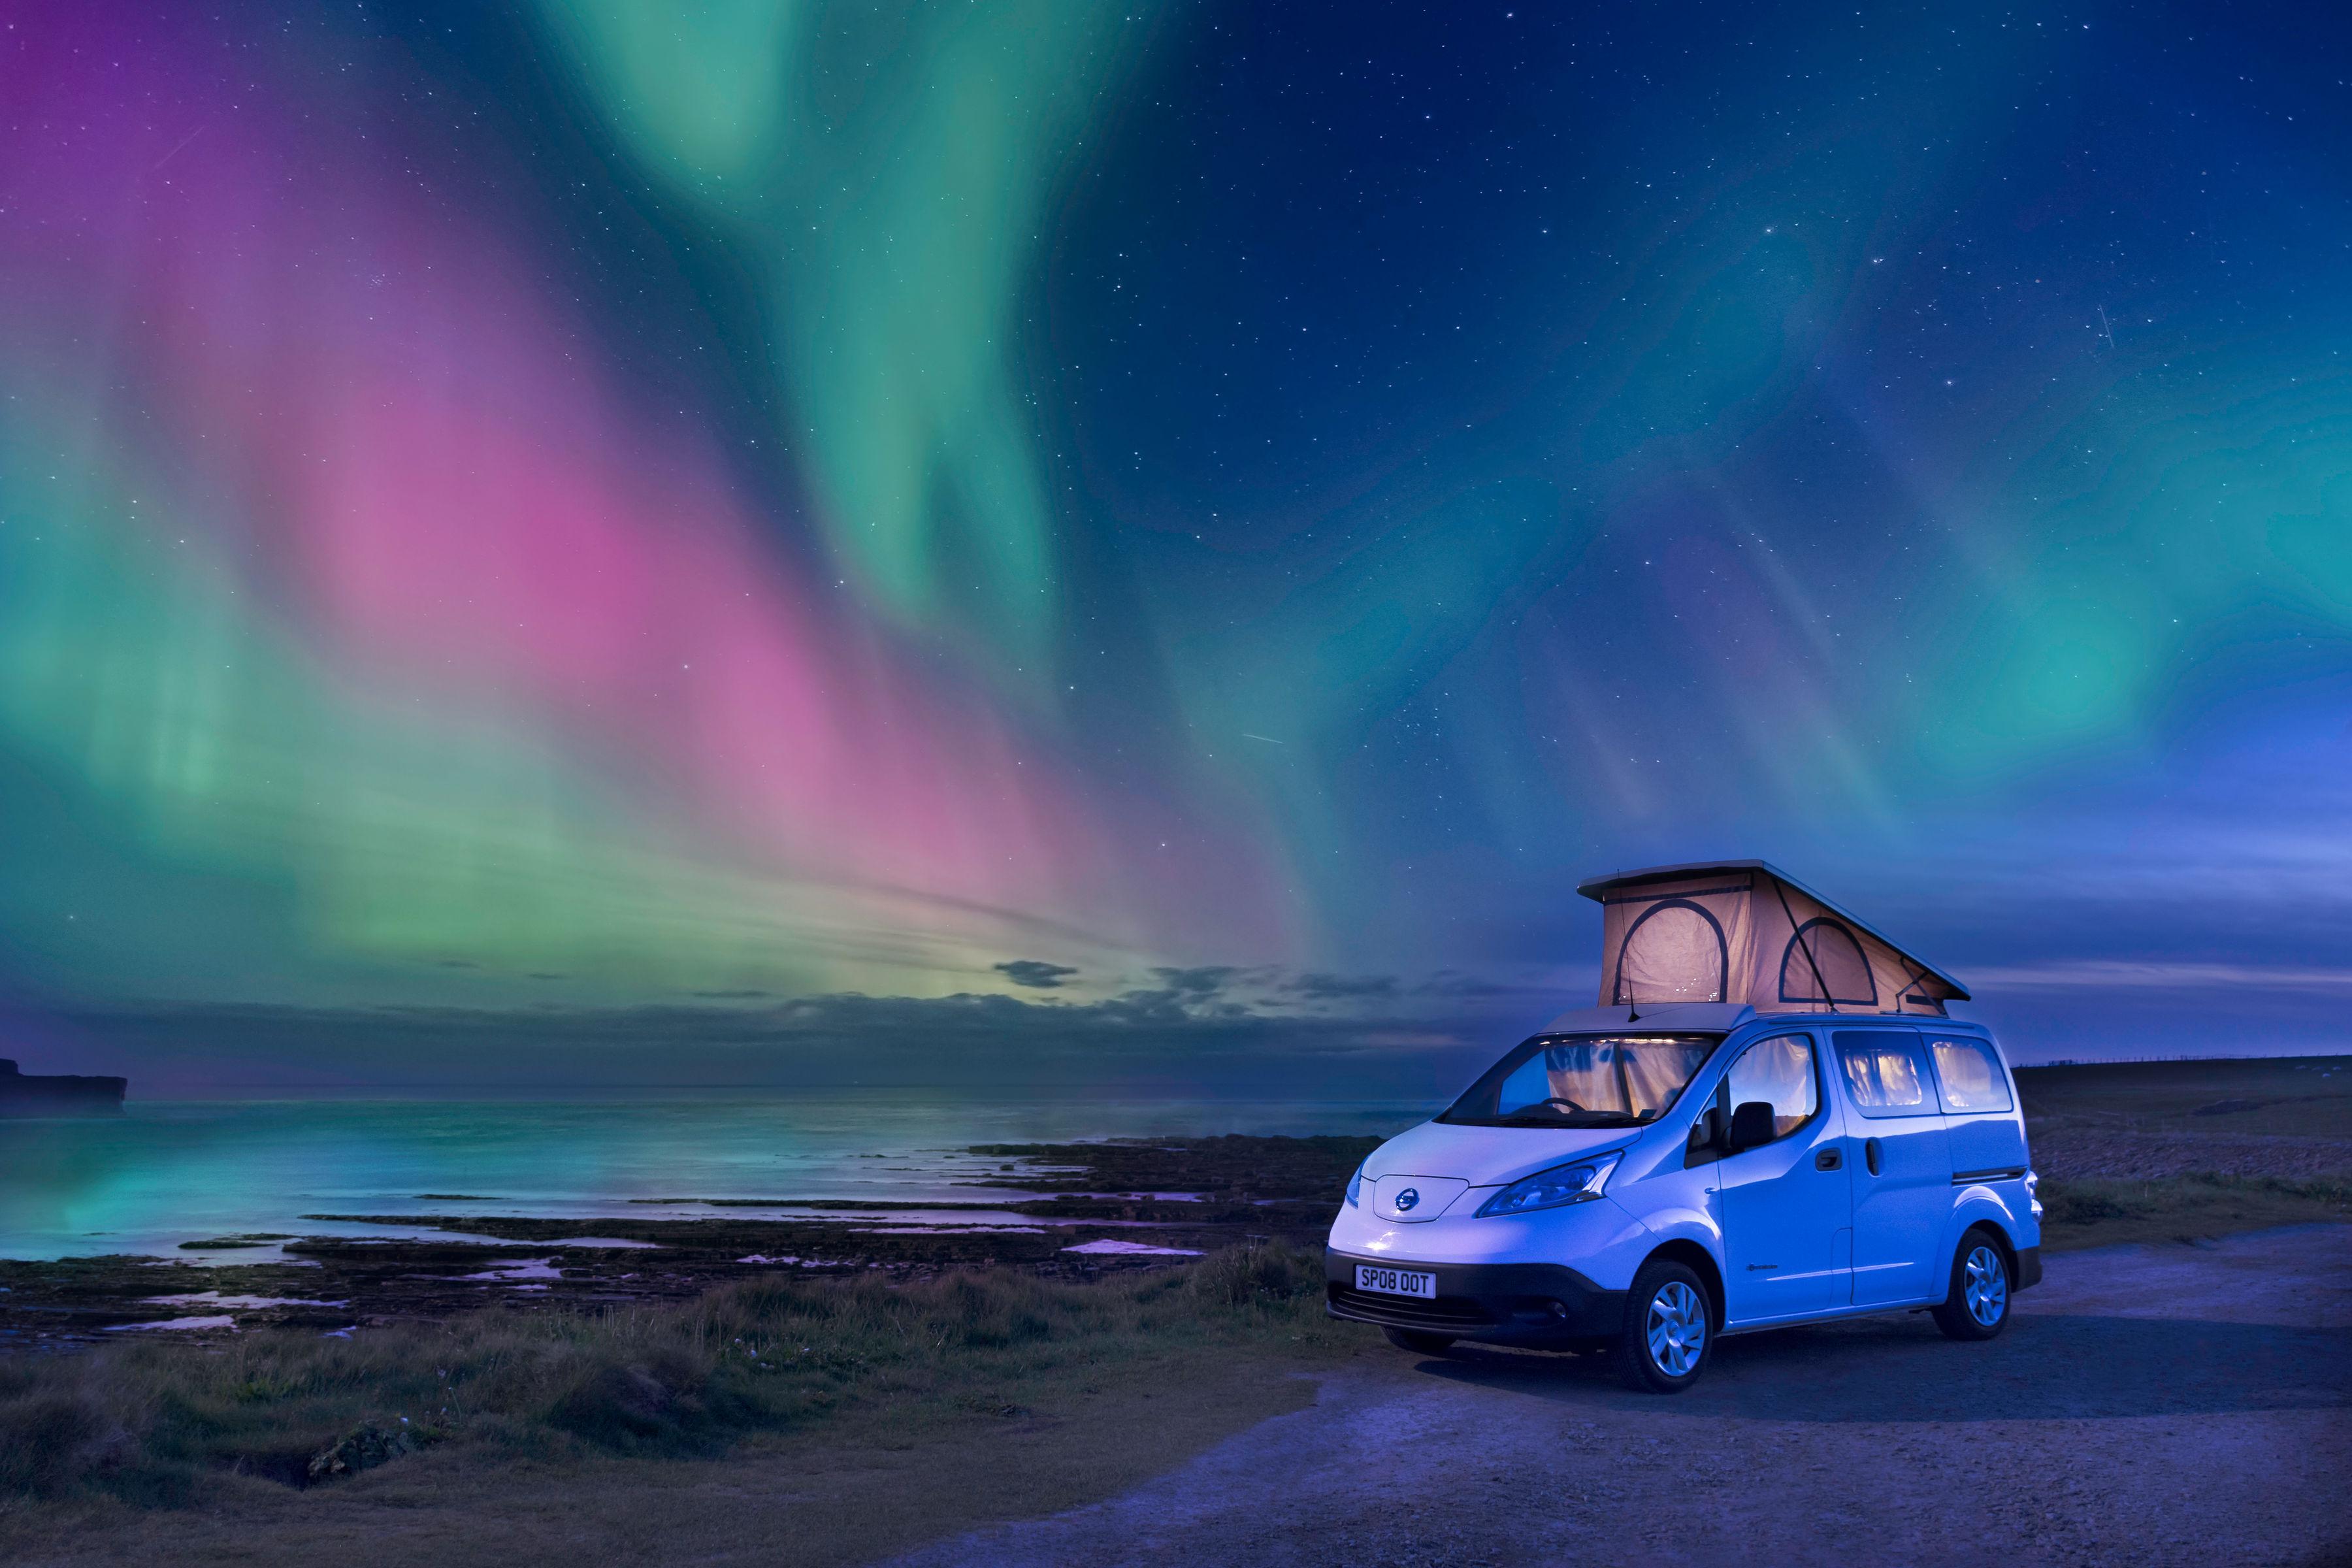 Northern Lights. Nisaan Env200 2019